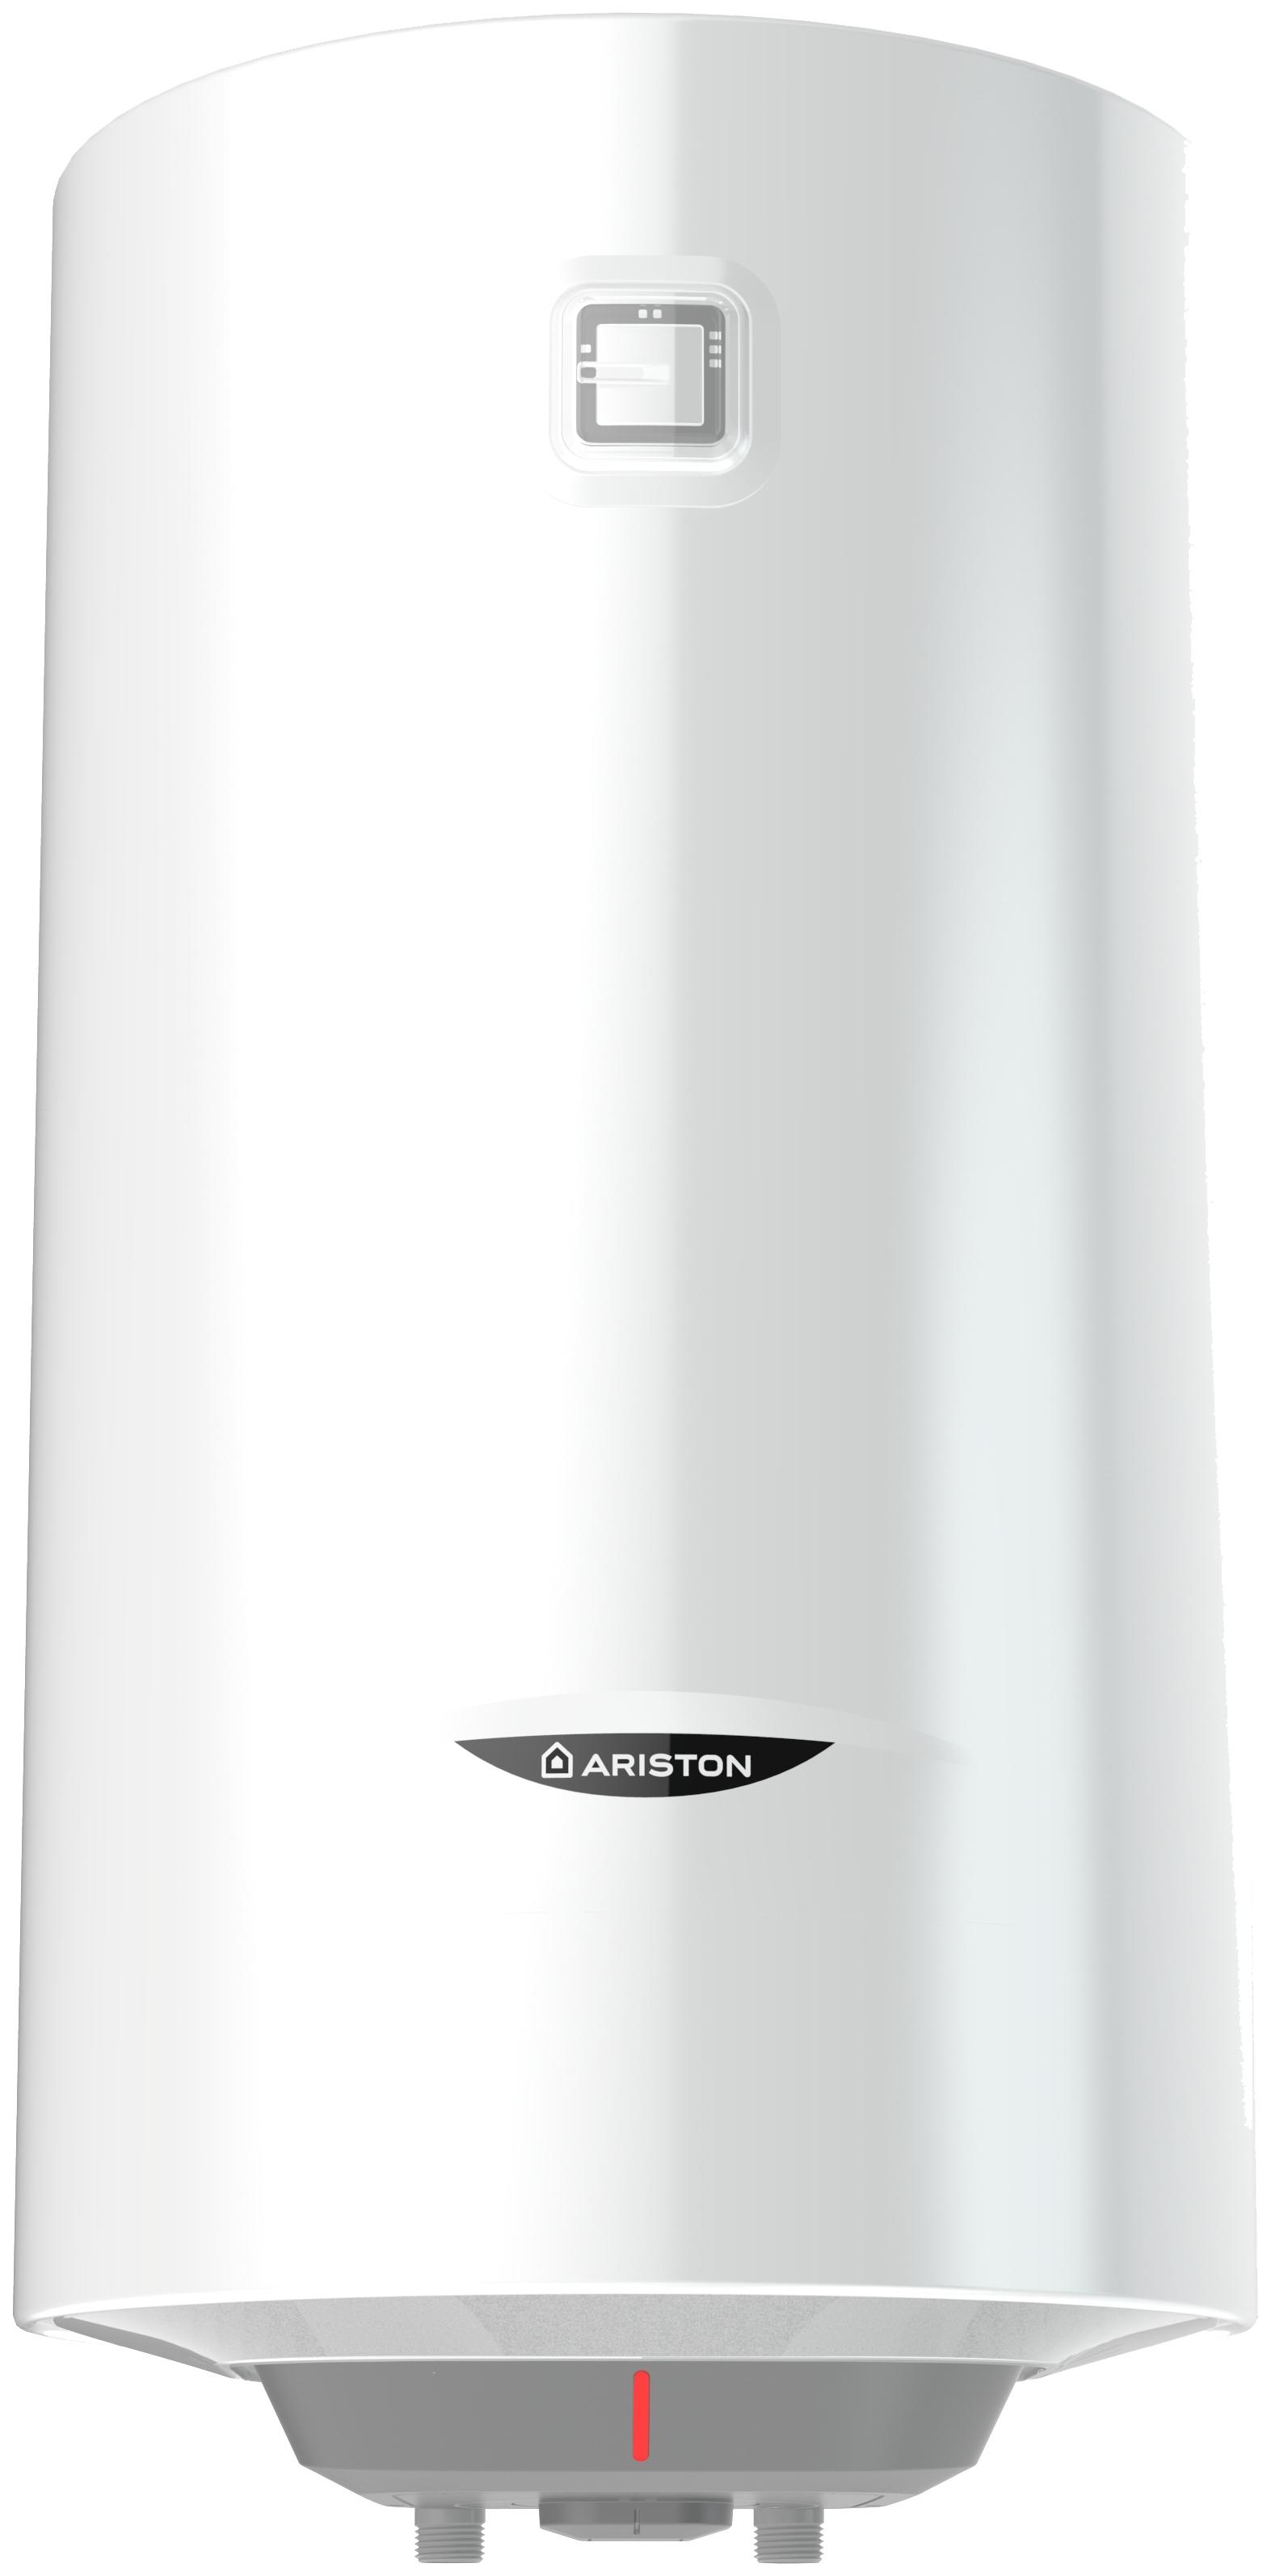 HOTPOINT-ARISTON PRO1 R ABS 30 V SLIM